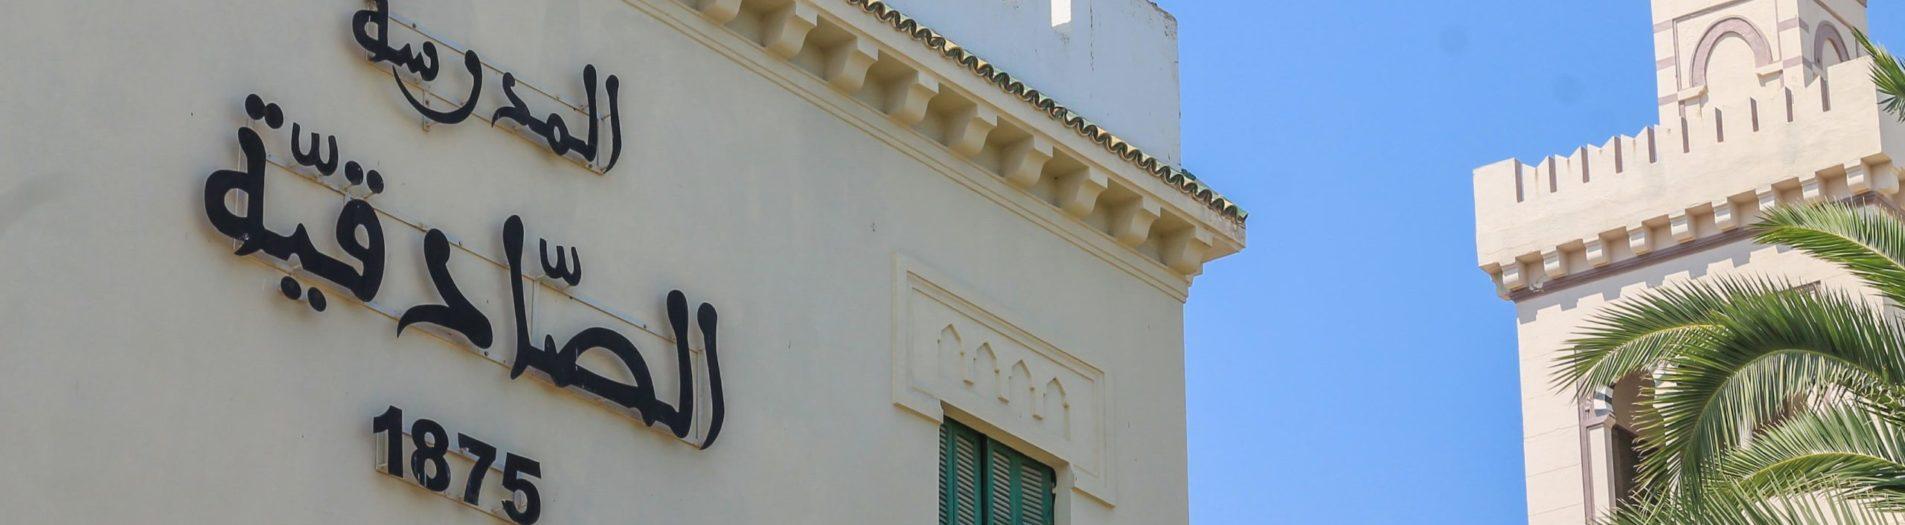 Ecole Sadiki